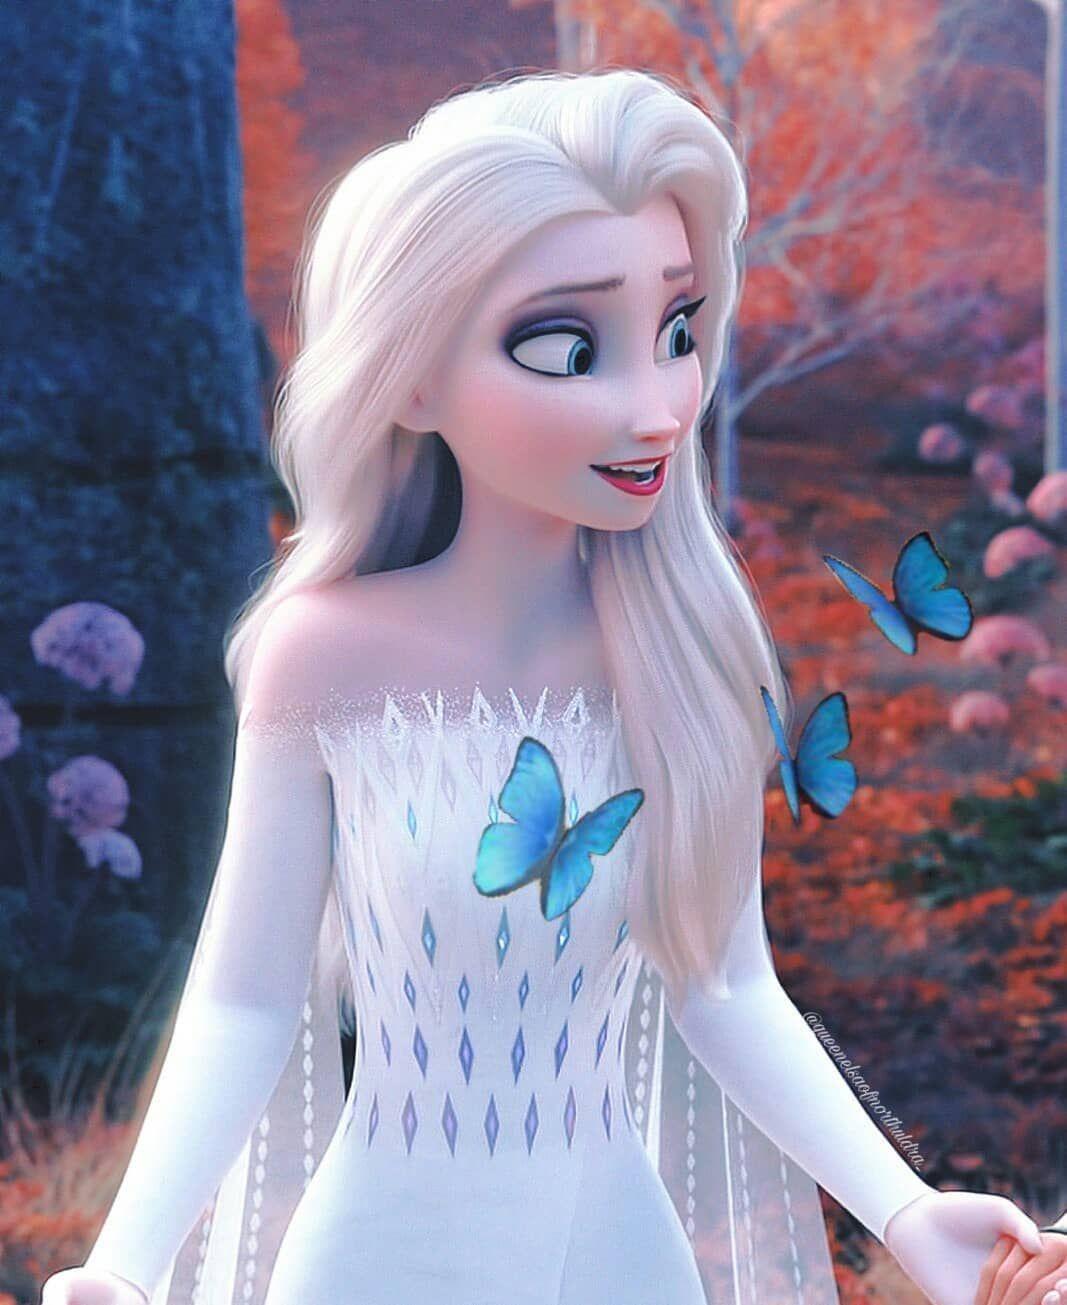 Elsa The Fifth Spirit On Instagram Reach 12k Followers Thank You So Much Everyone In 2020 Disney Princess Pictures Disney Princess Elsa Frozen Disney Movie